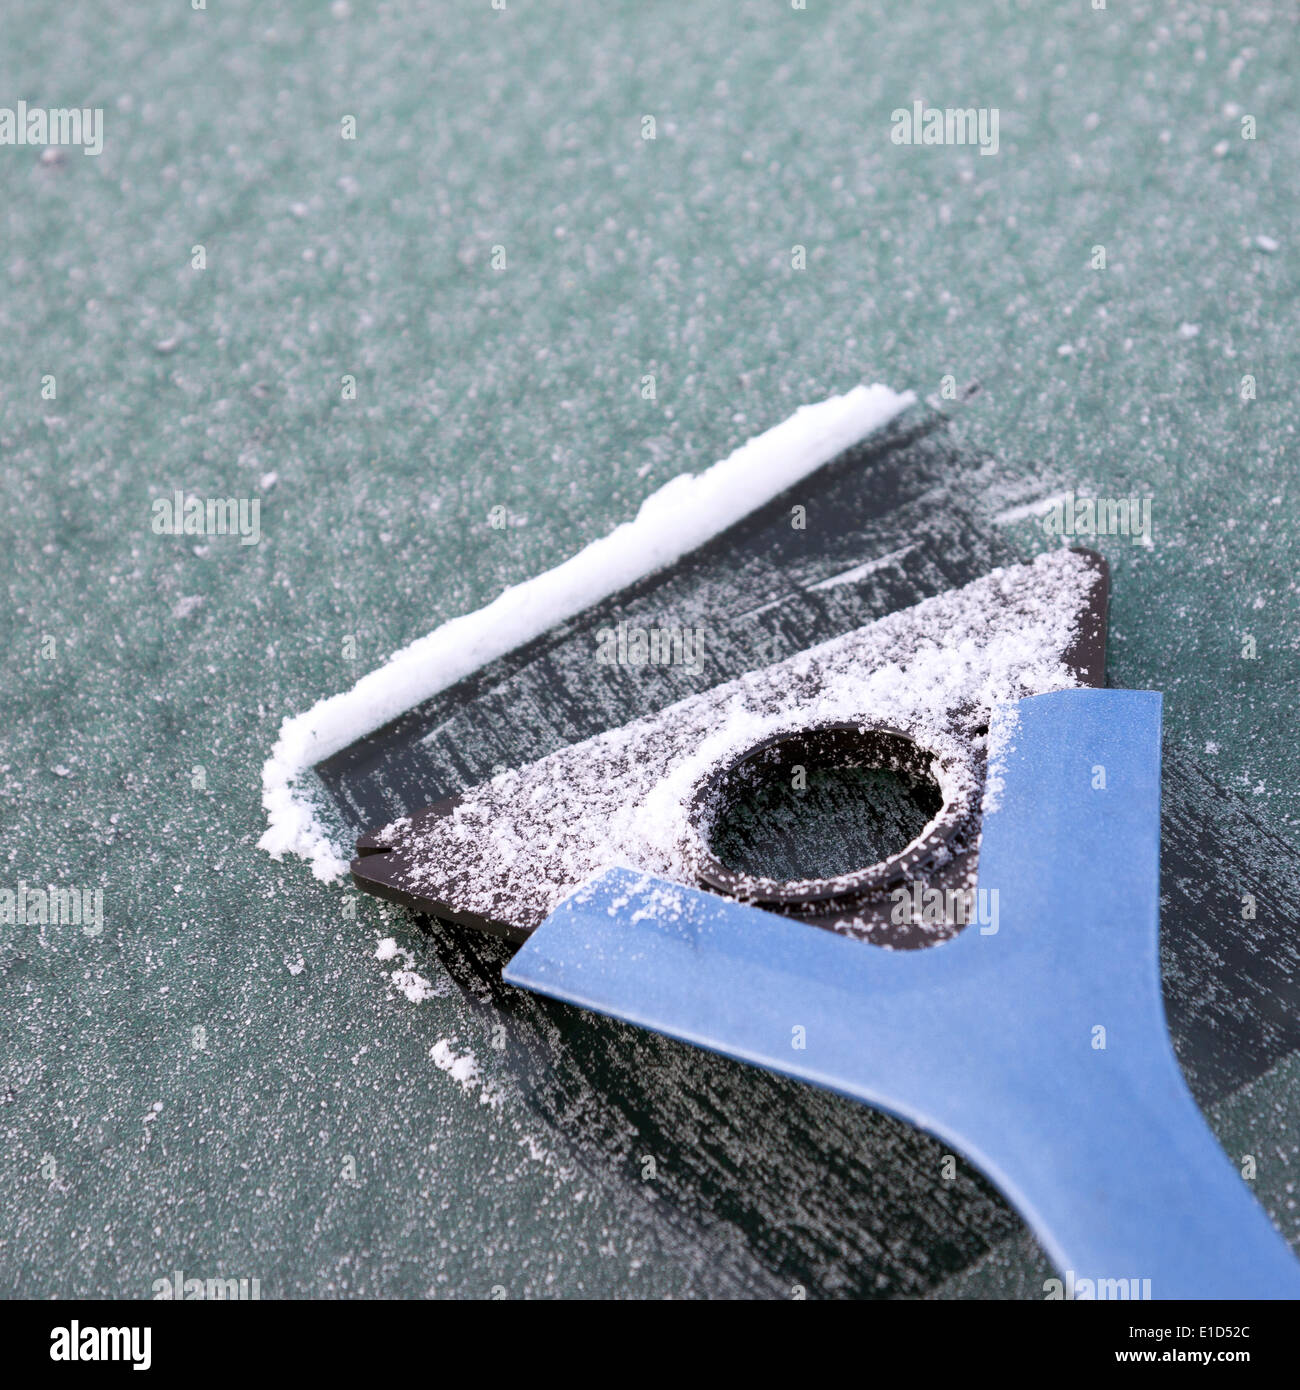 Window scraper on icy car windshield - Stock Image